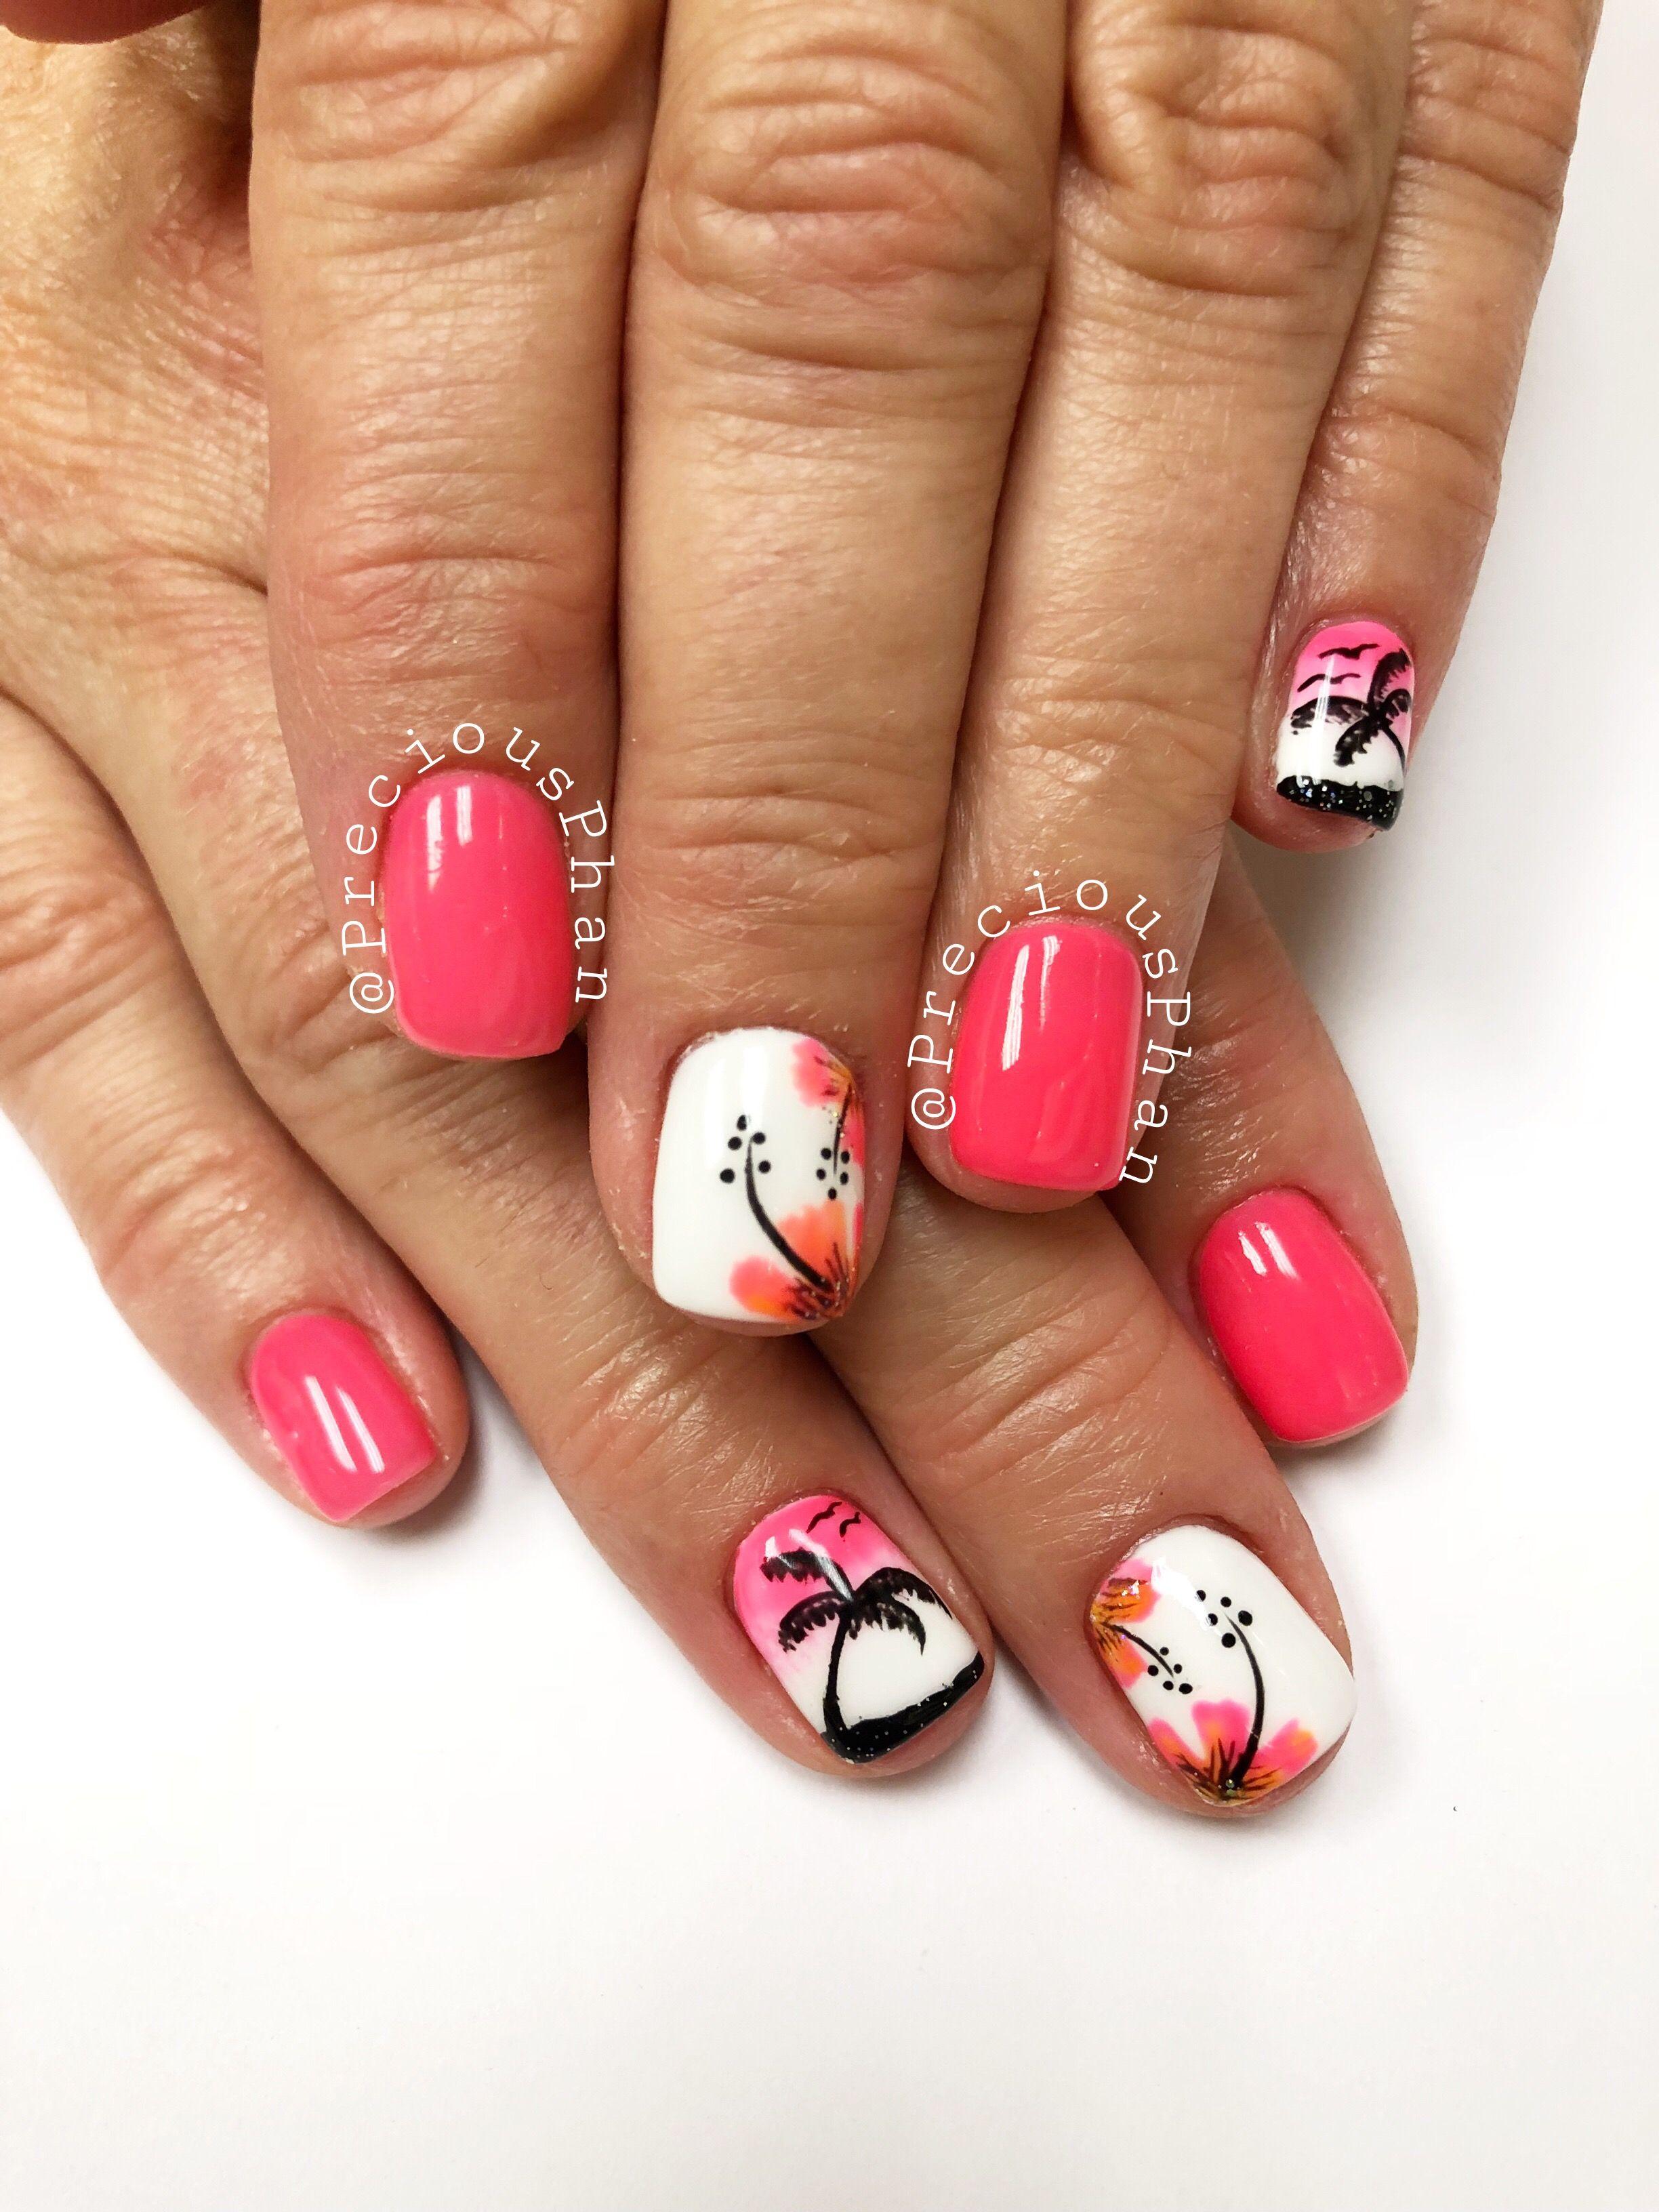 Summer Nails Neon Nails Hibiscus Nails Palm Trees Preciousphan Summer Pedicure Colors Palm Tree Nails Pedicure Colors